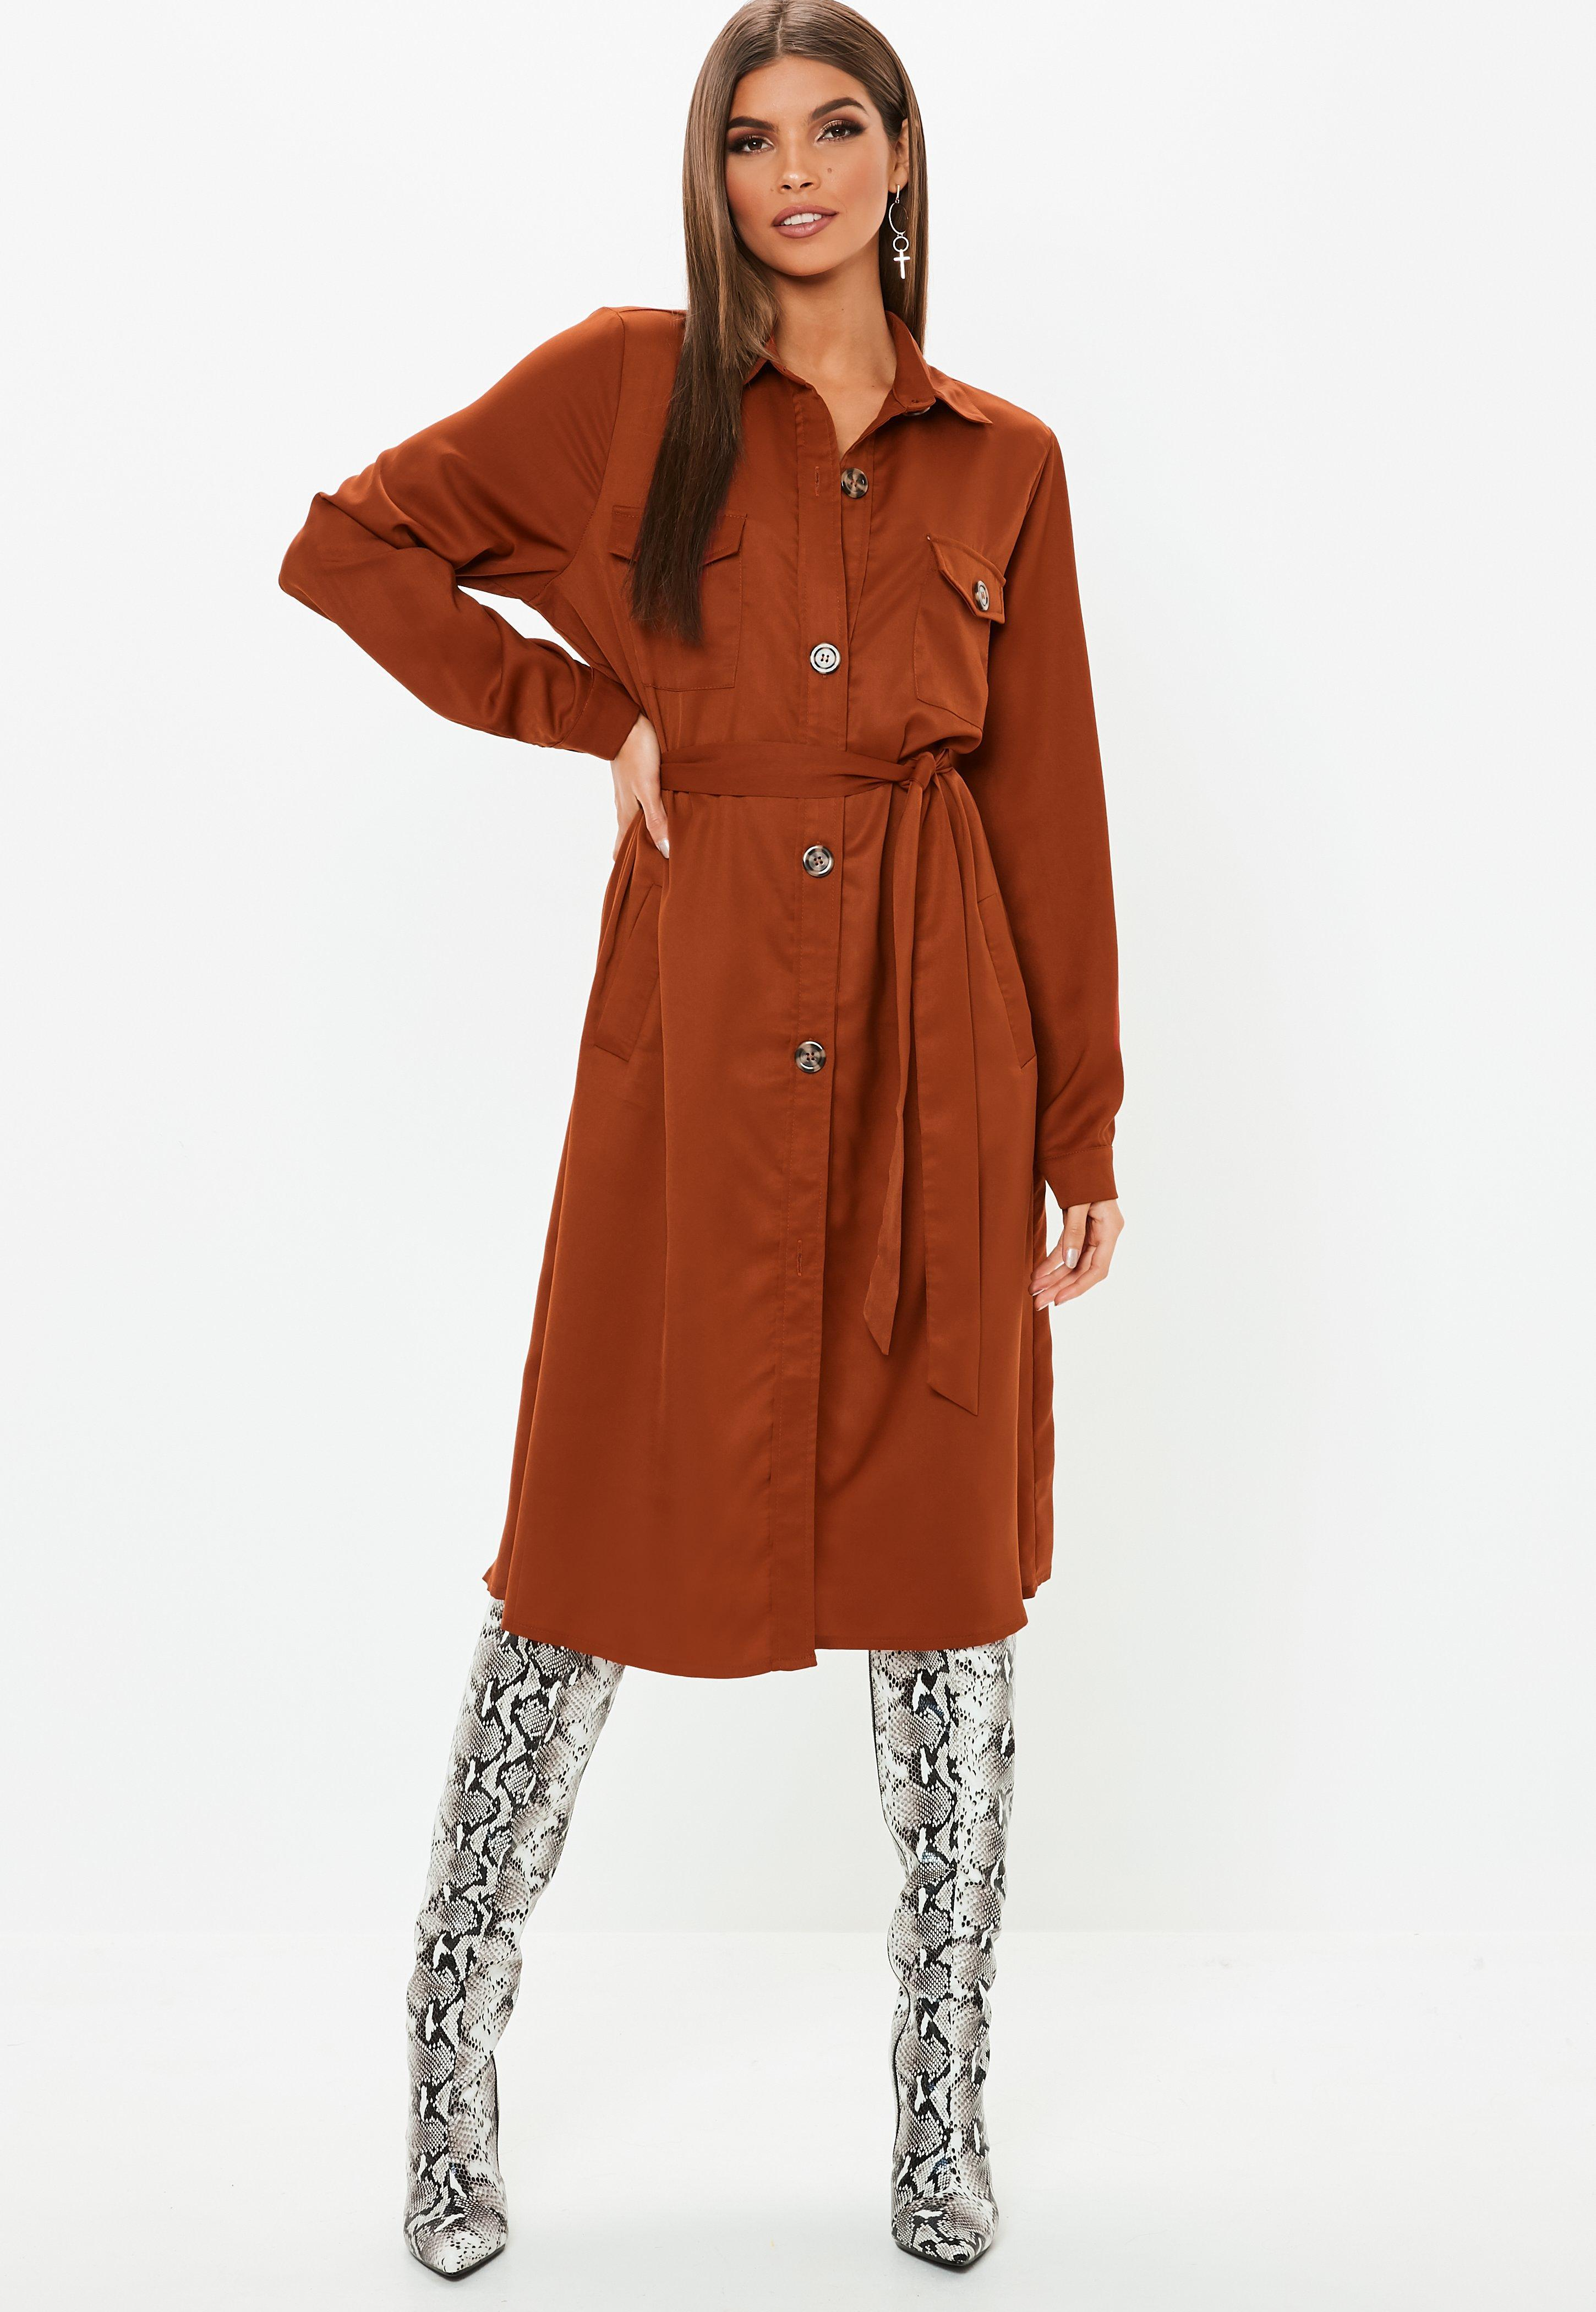 80b722417b885 Lyst - Missguided Rust Tie Waist Utility Shirt Dress in Brown